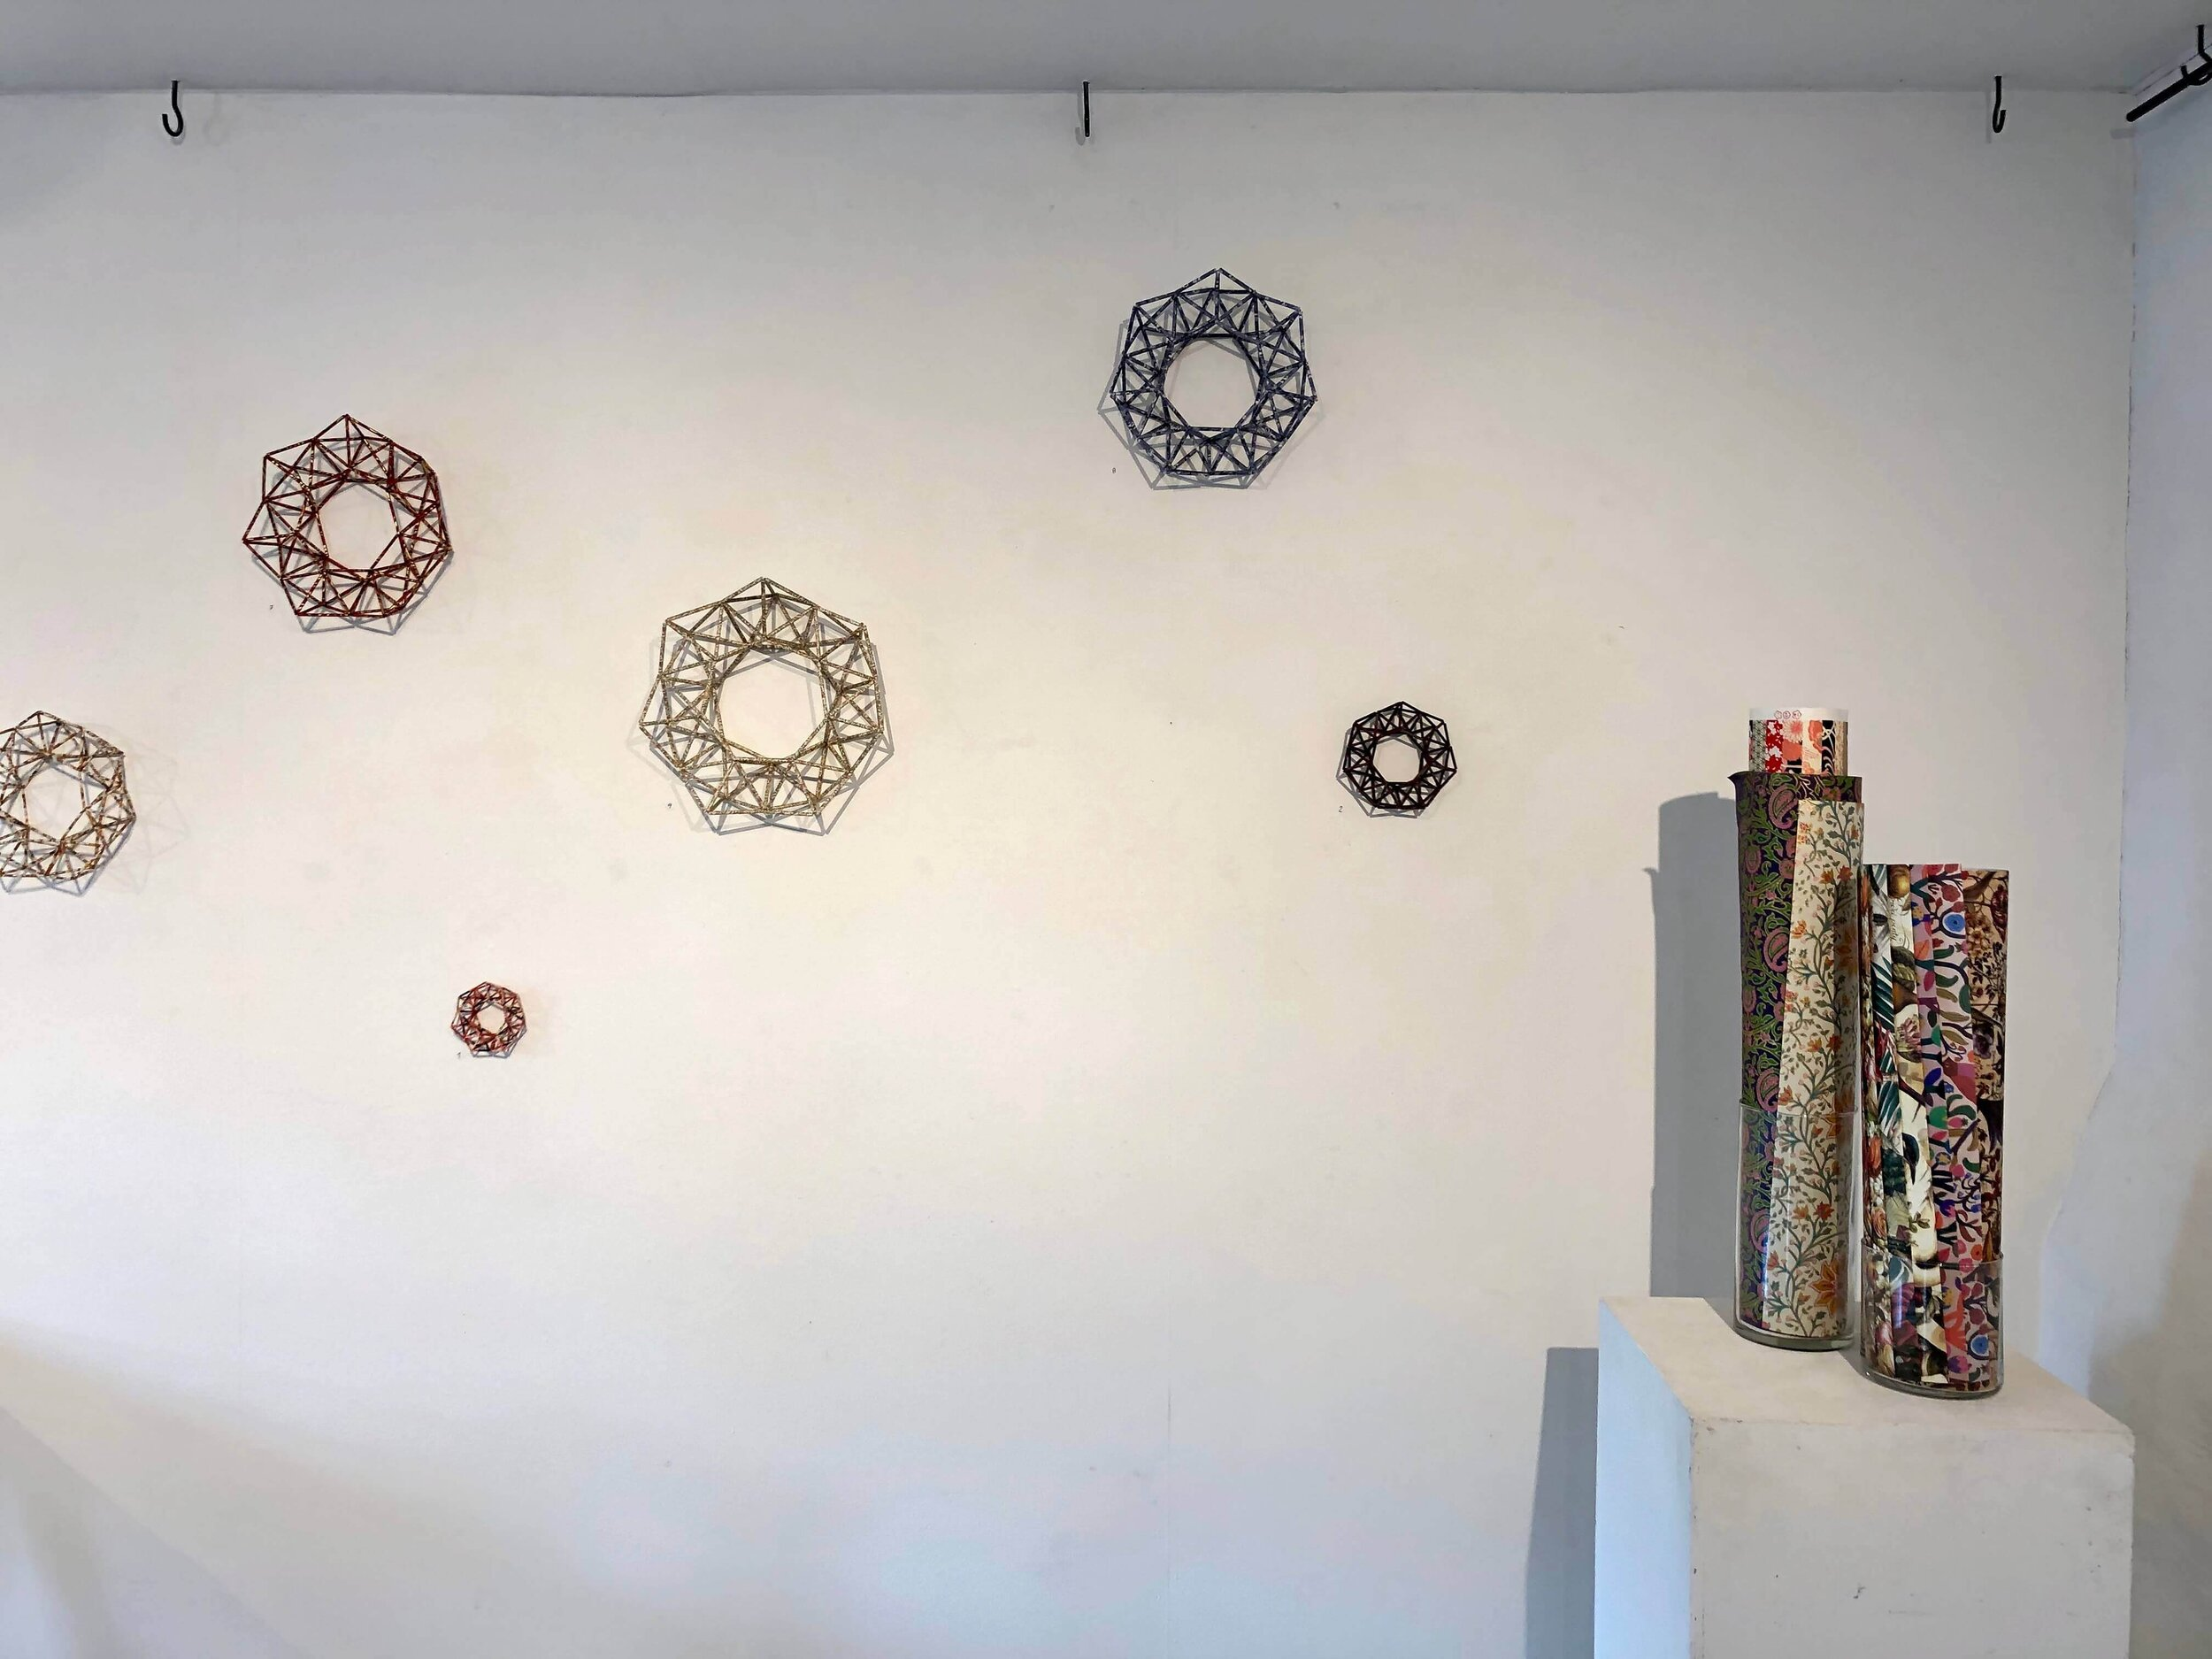 Linda-Allard-Forsman--Tomas-Robefelt--papper--sadelmakarlangan--2019--21.jpg